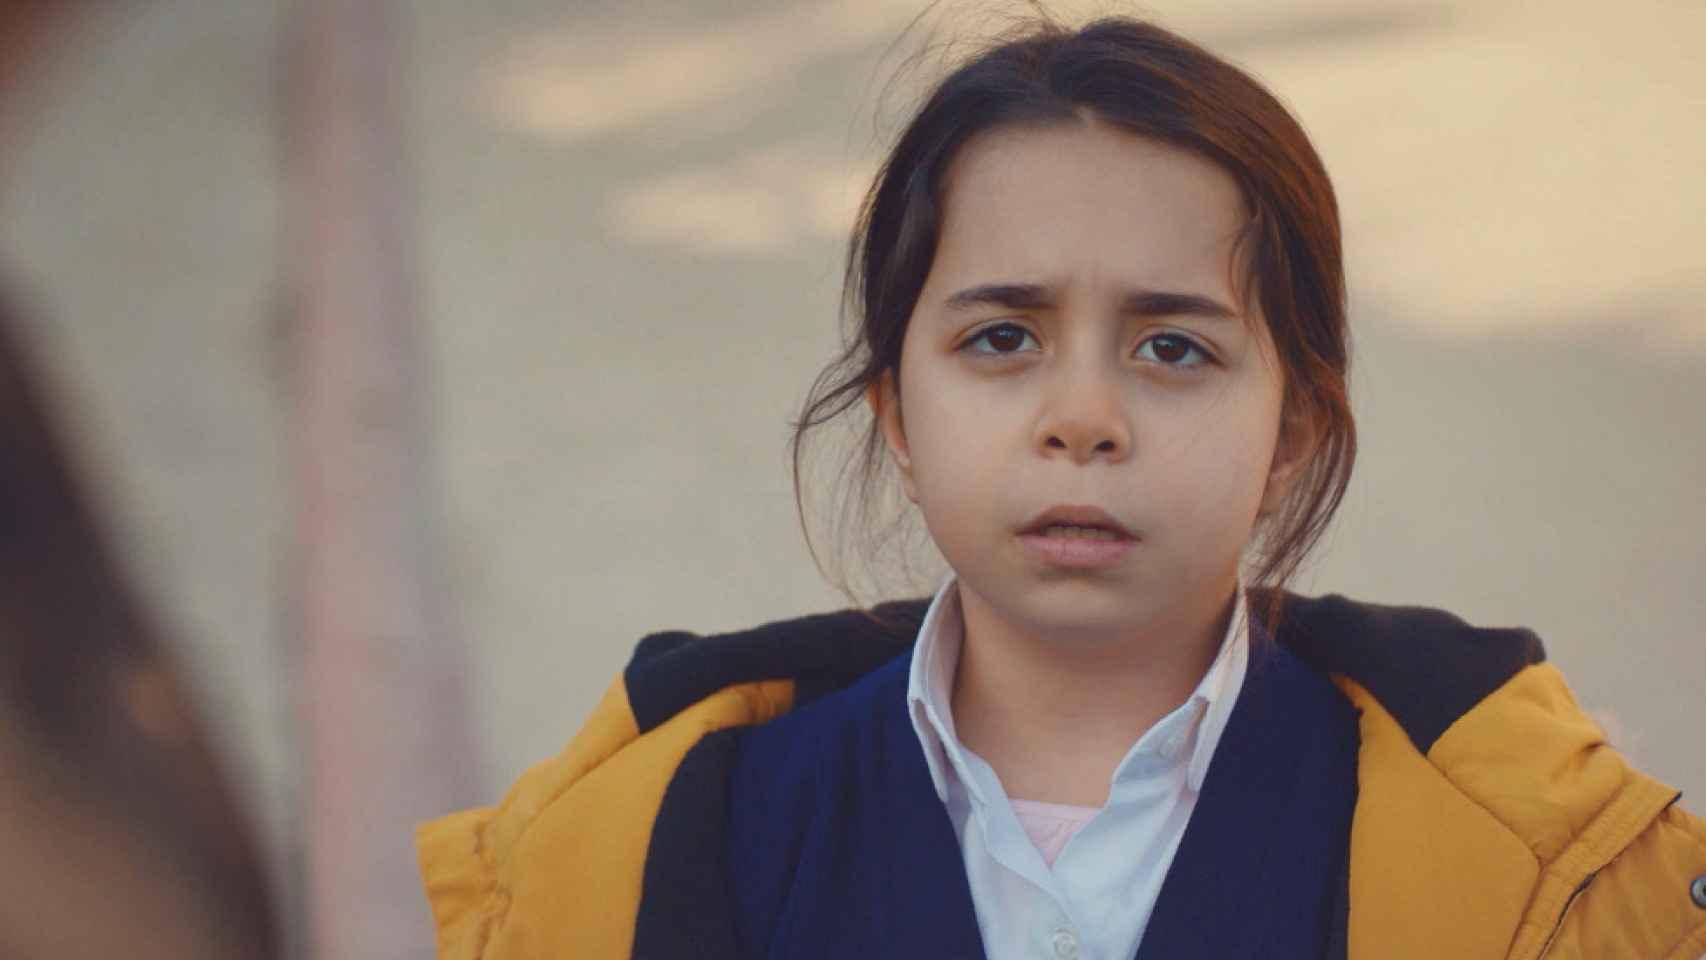 Avance en fotos de 'Mi hija': Öykü vuelve a recordar: ¿Papá?